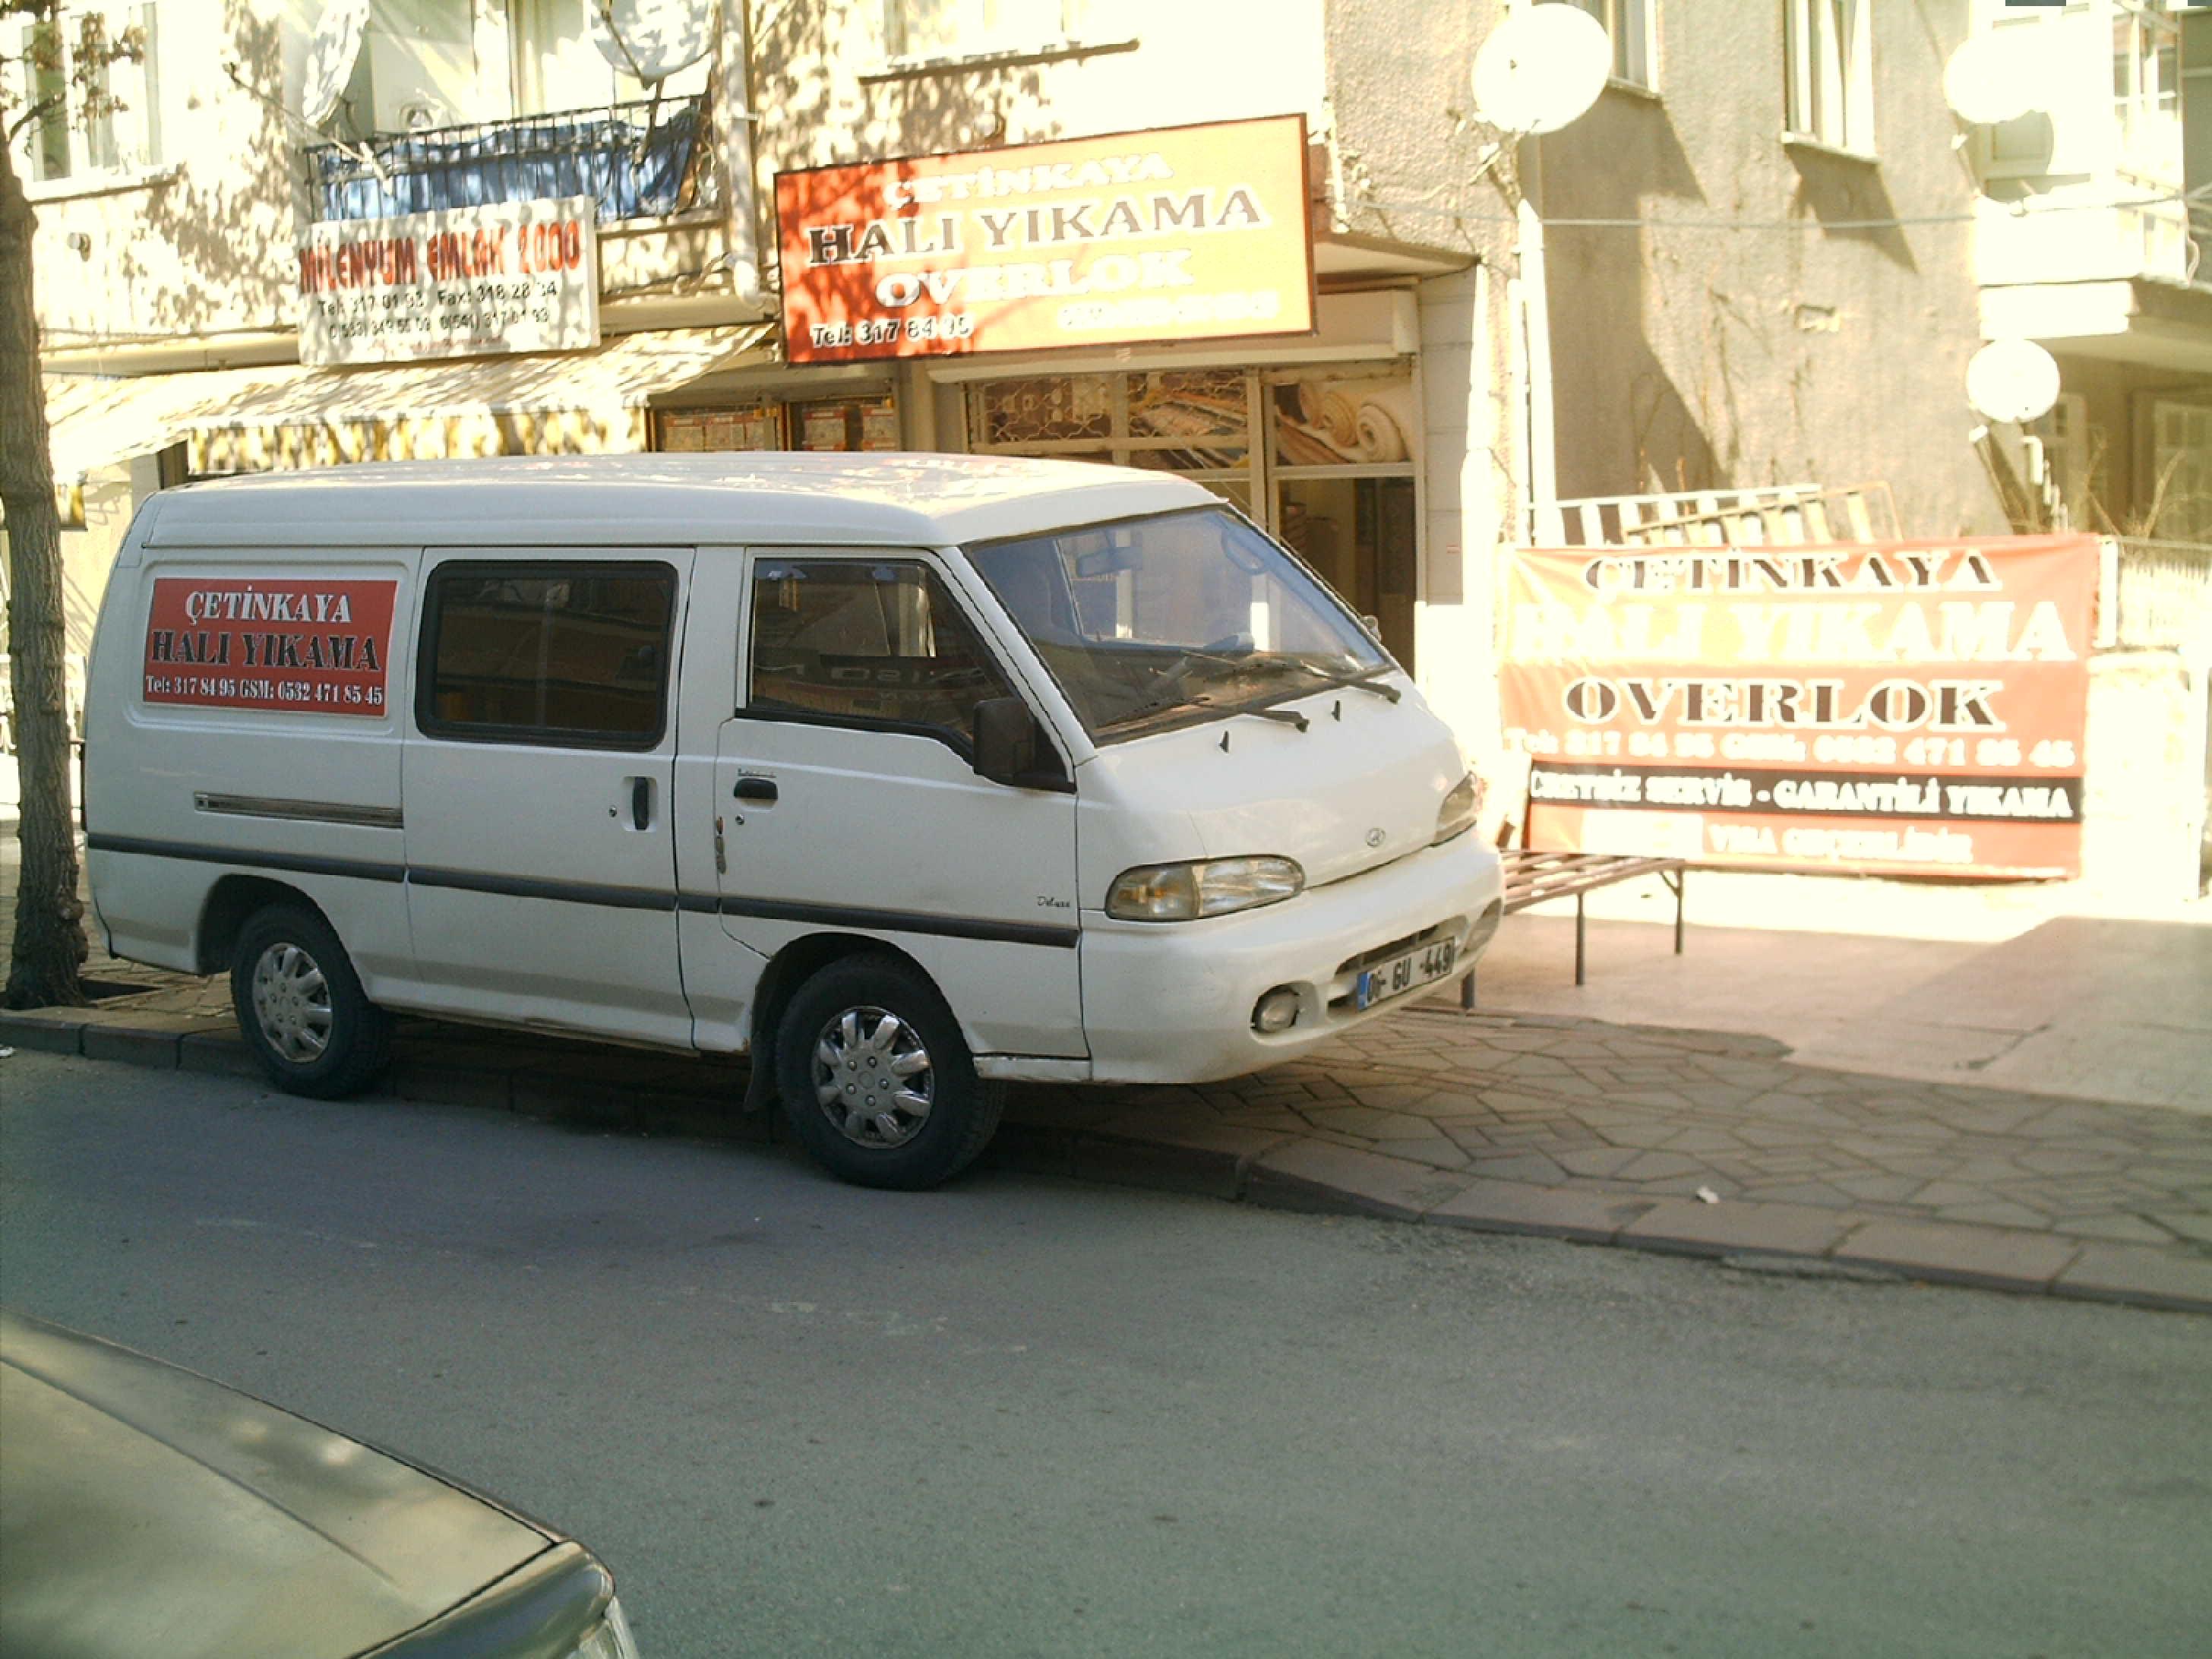 hasköy_hali_yikama_servis-1 (1)